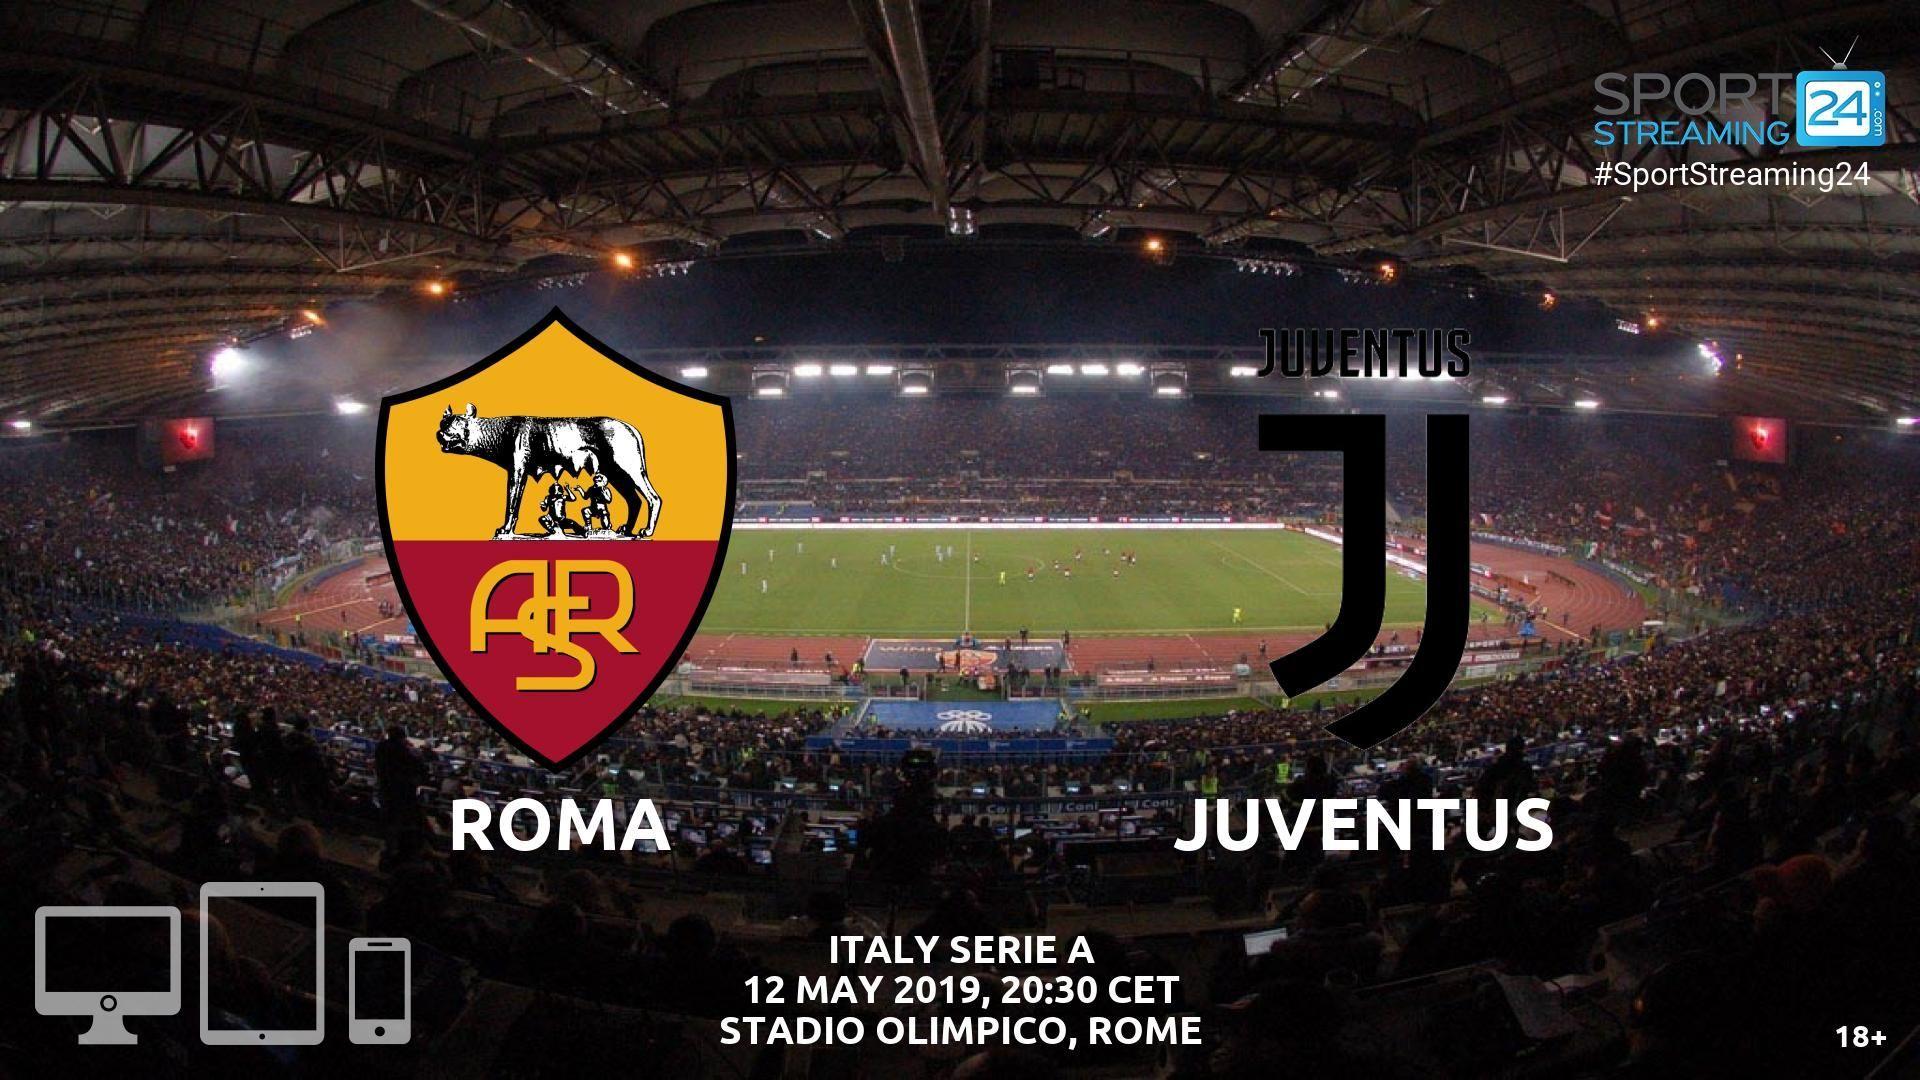 Roma v Juventus Live Streaming Football Juventus live